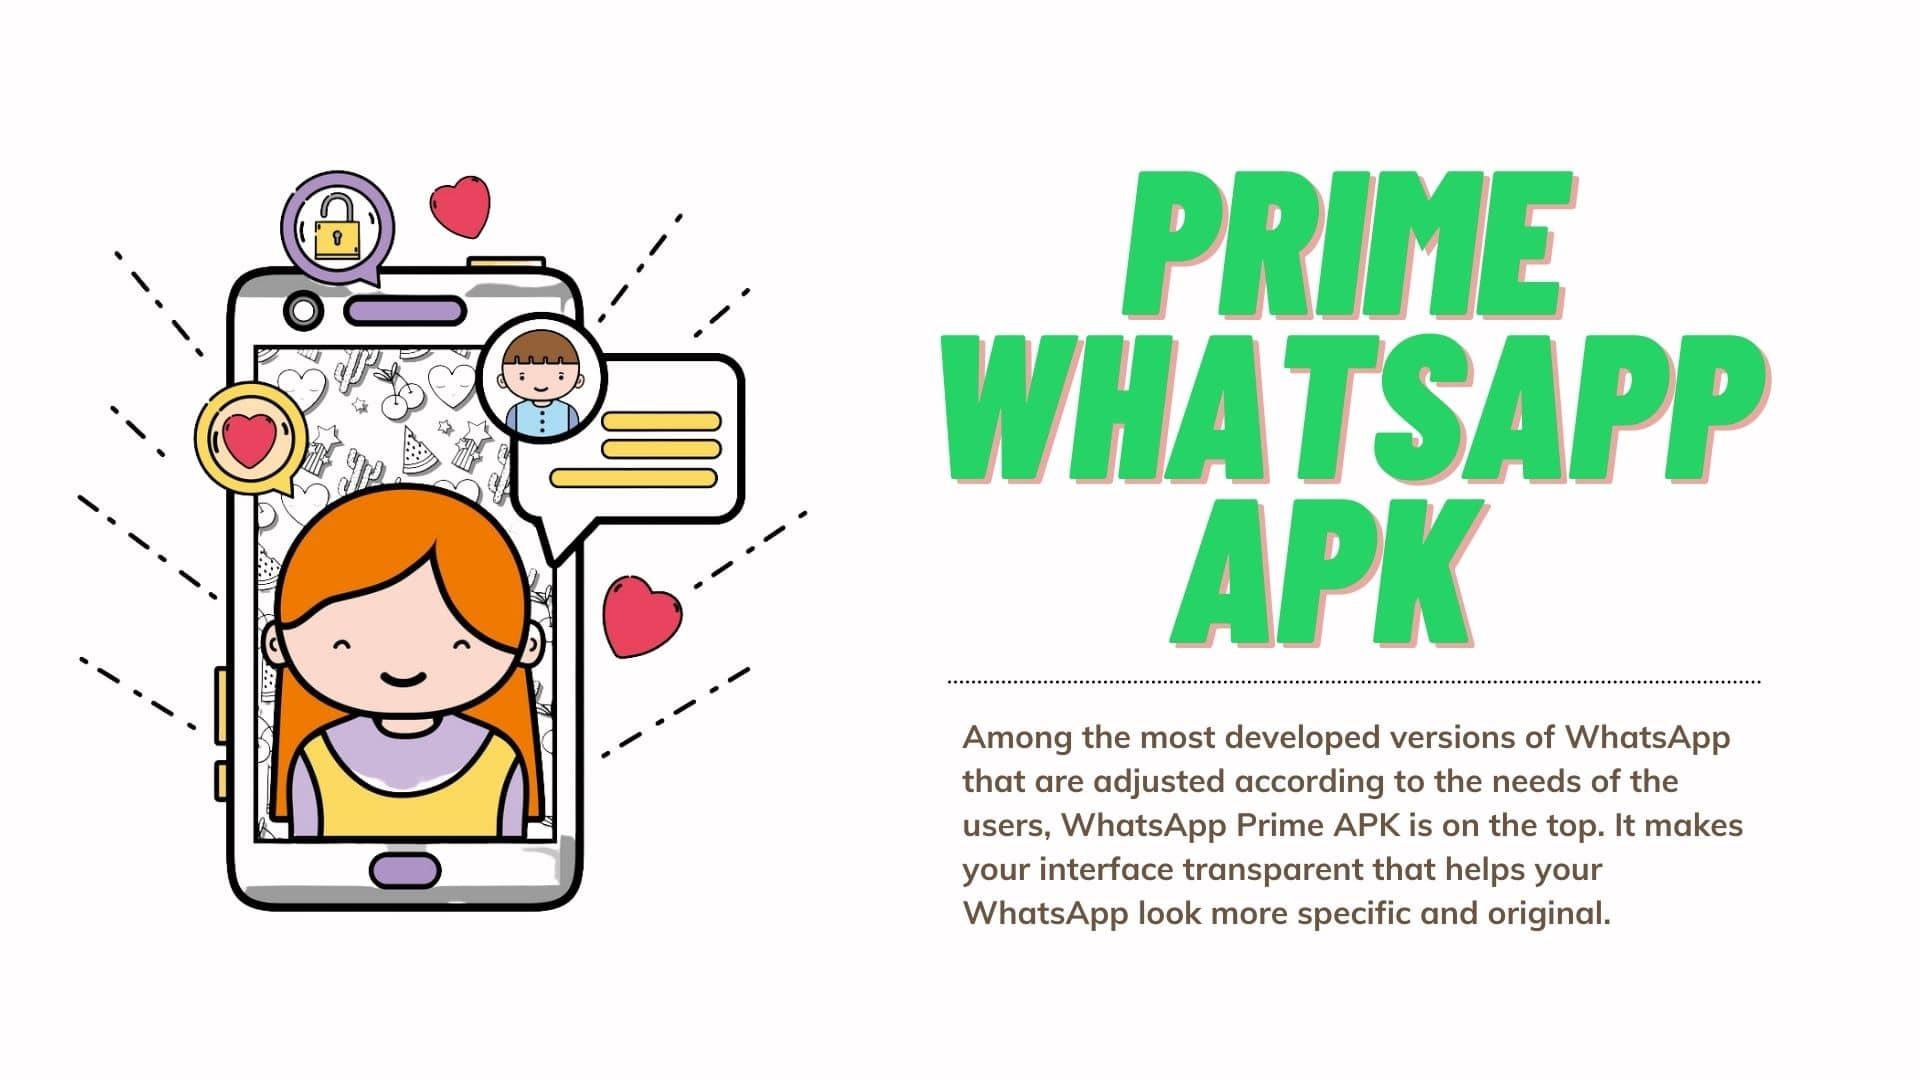 Prime WhatsApp APK